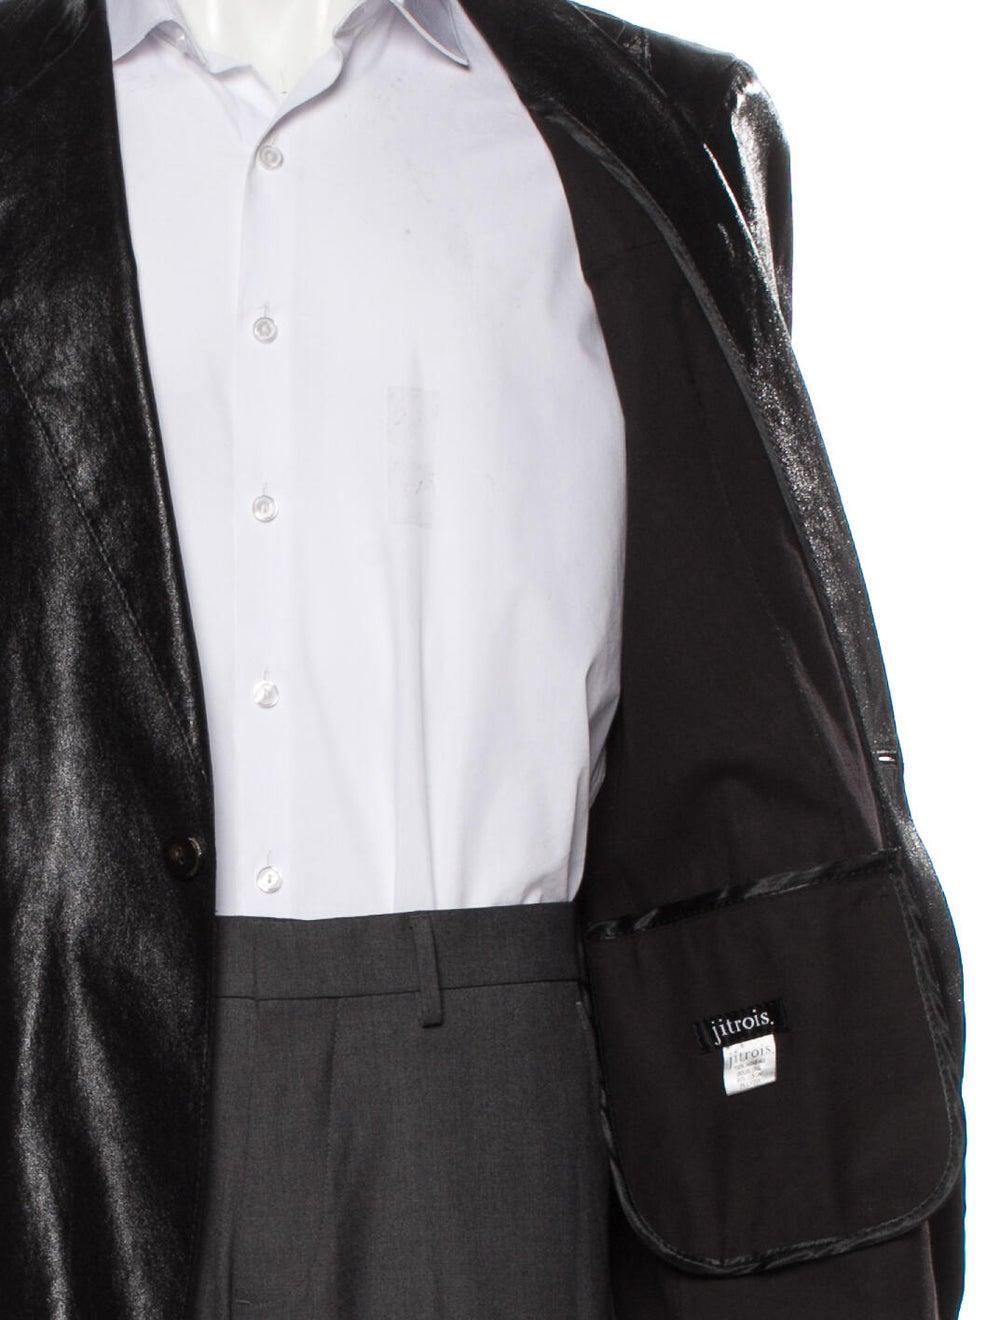 Jitrois Jacket Black - image 4